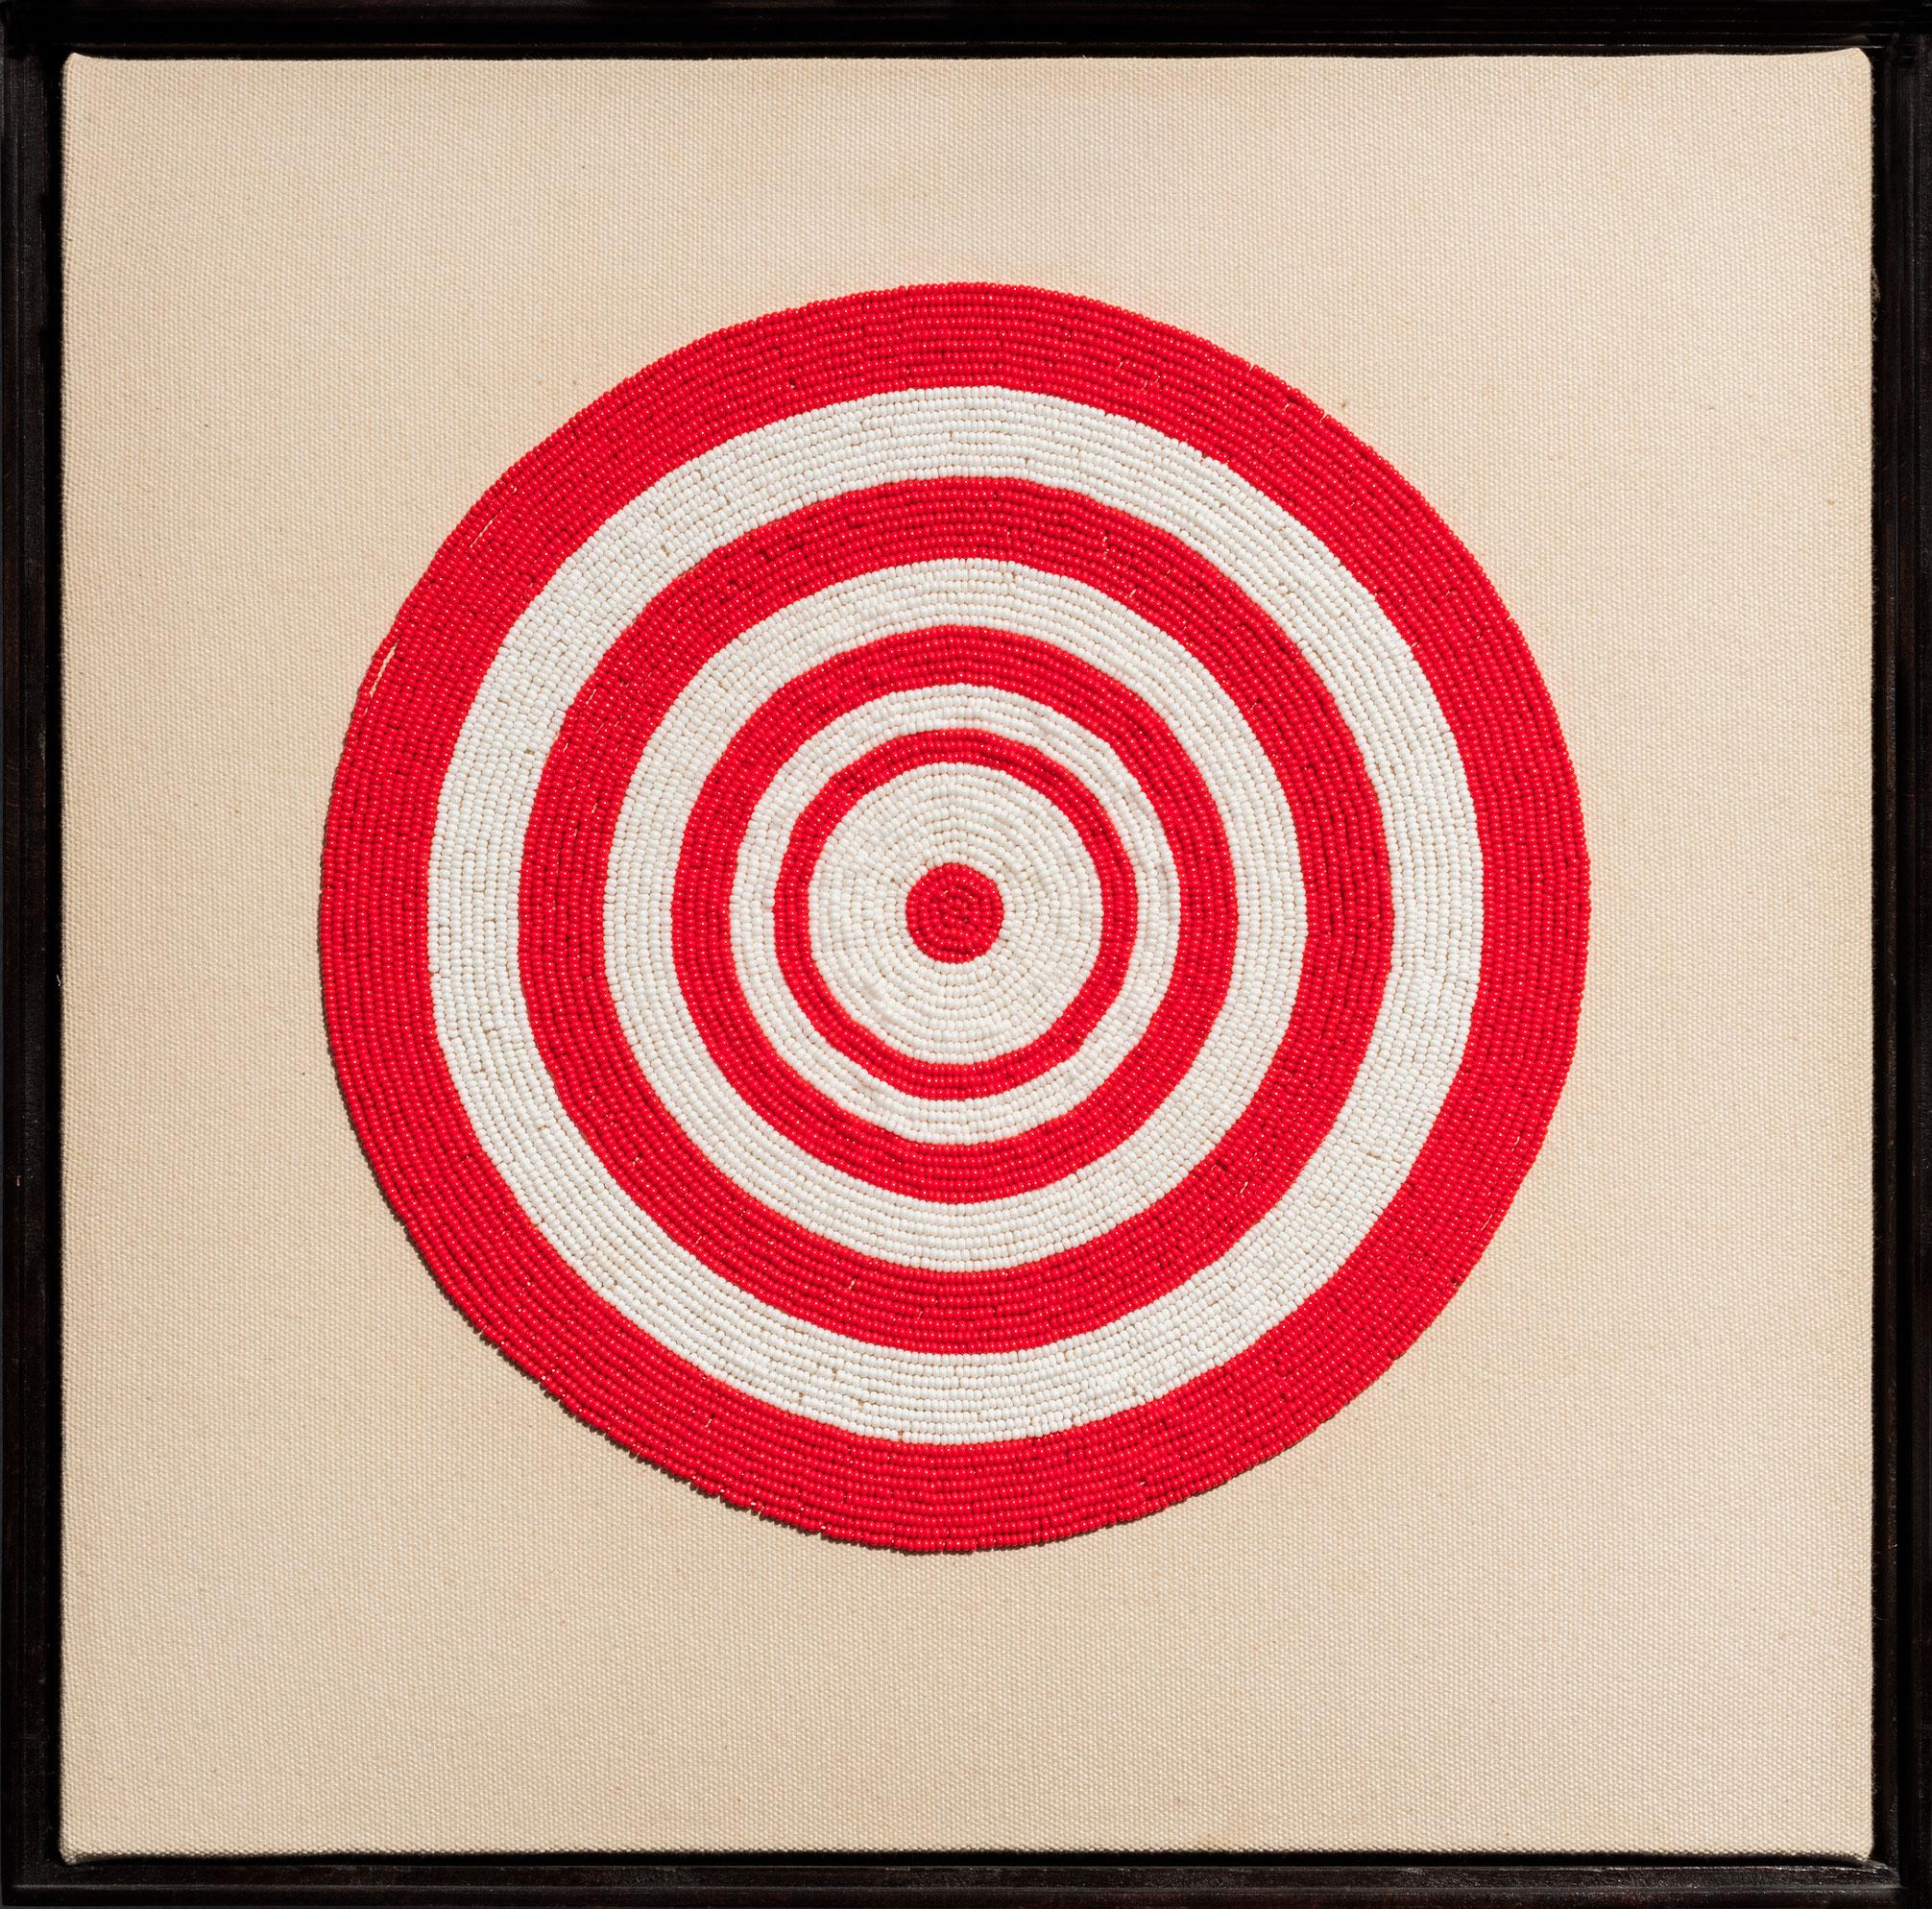 Contact: When Odd Gets Even, 2002, Nadia Myre, Perles de rocaille, fil et toile.